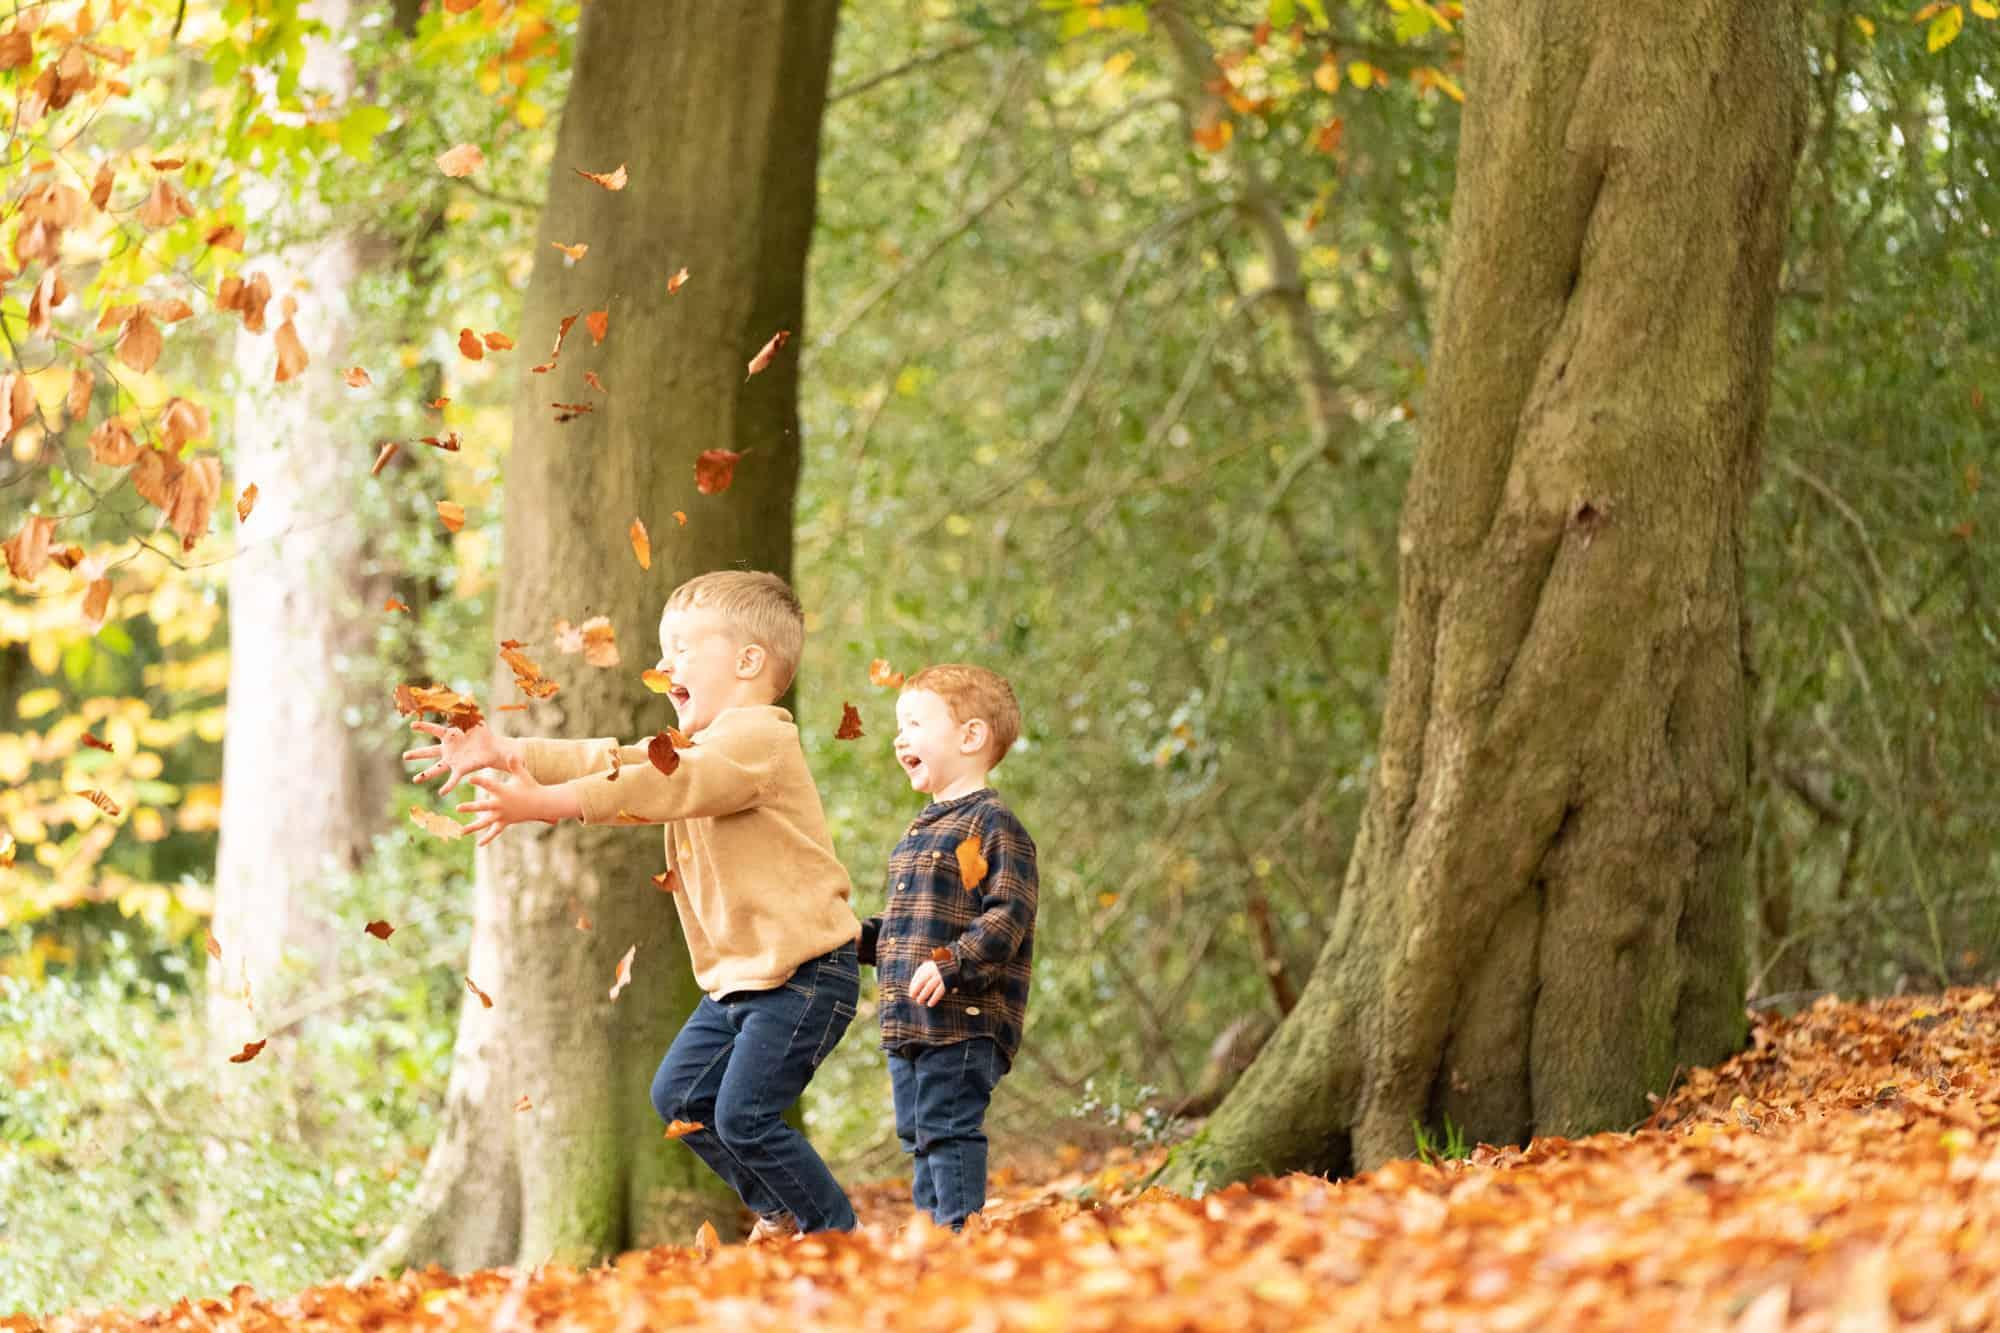 Bromley family photographer capturing autumn fun